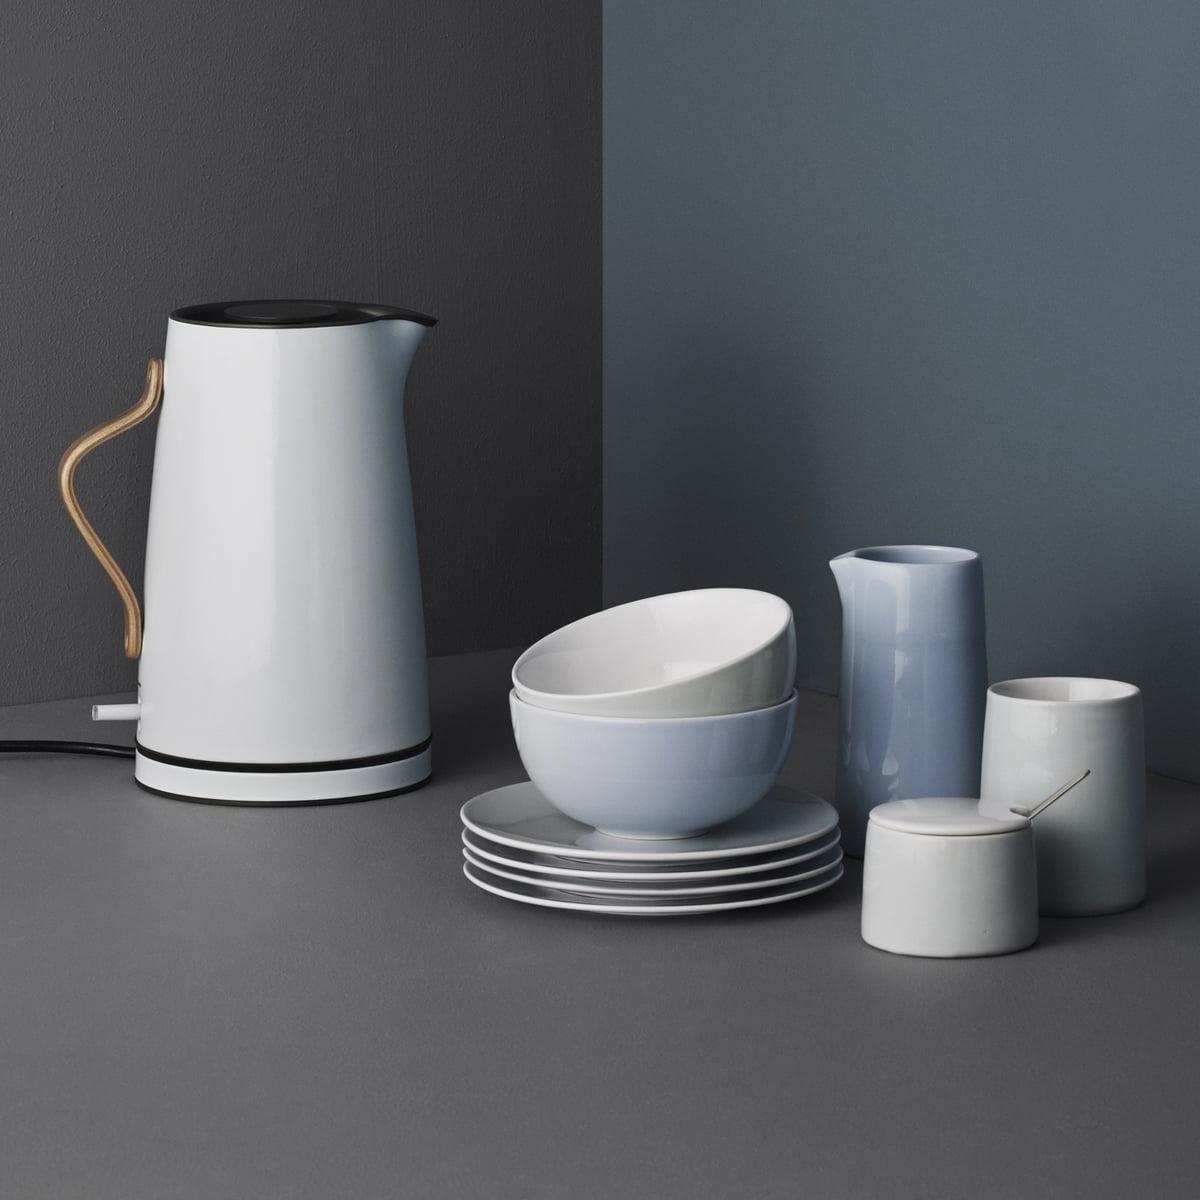 emma plates set of 2 by stelton in the shop. Black Bedroom Furniture Sets. Home Design Ideas